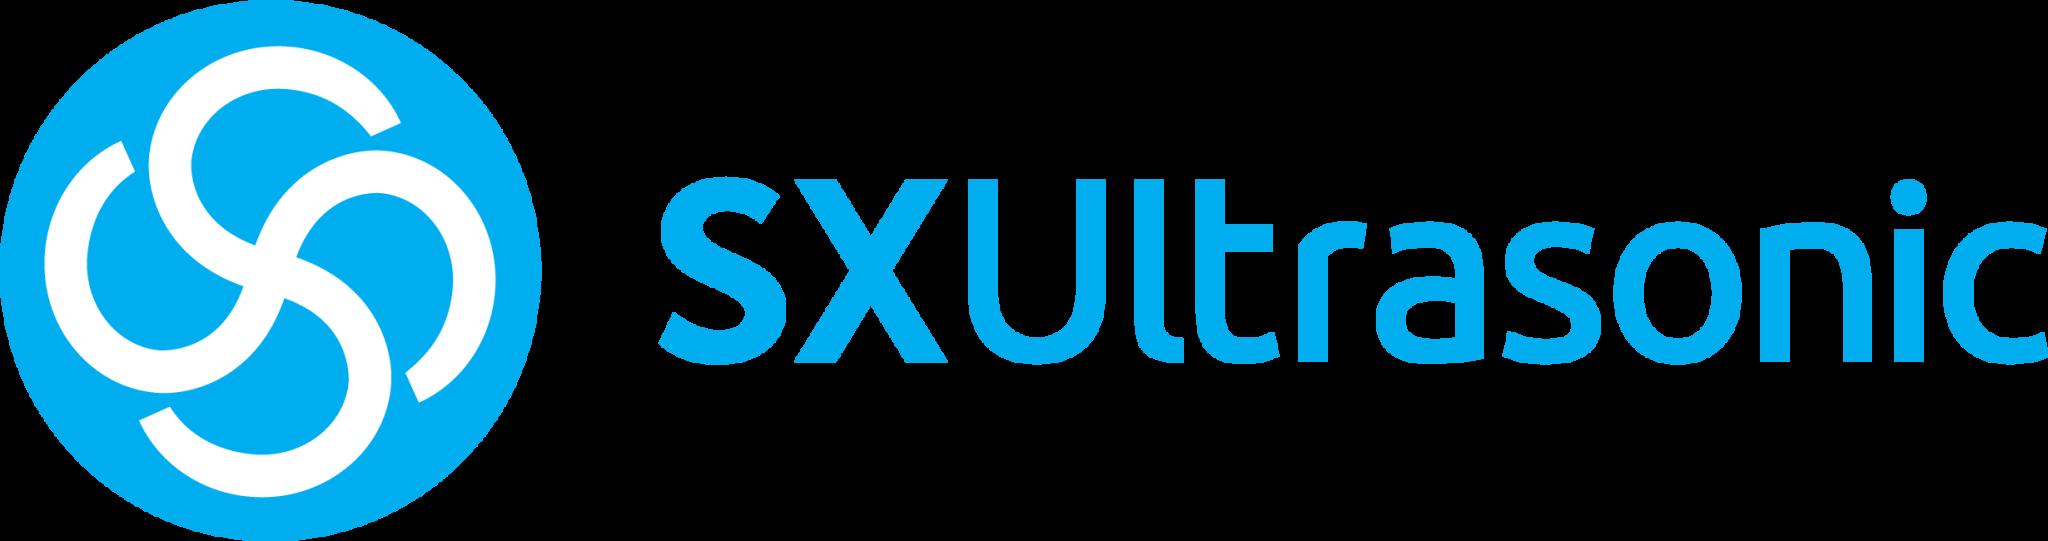 SXULTRASONIC